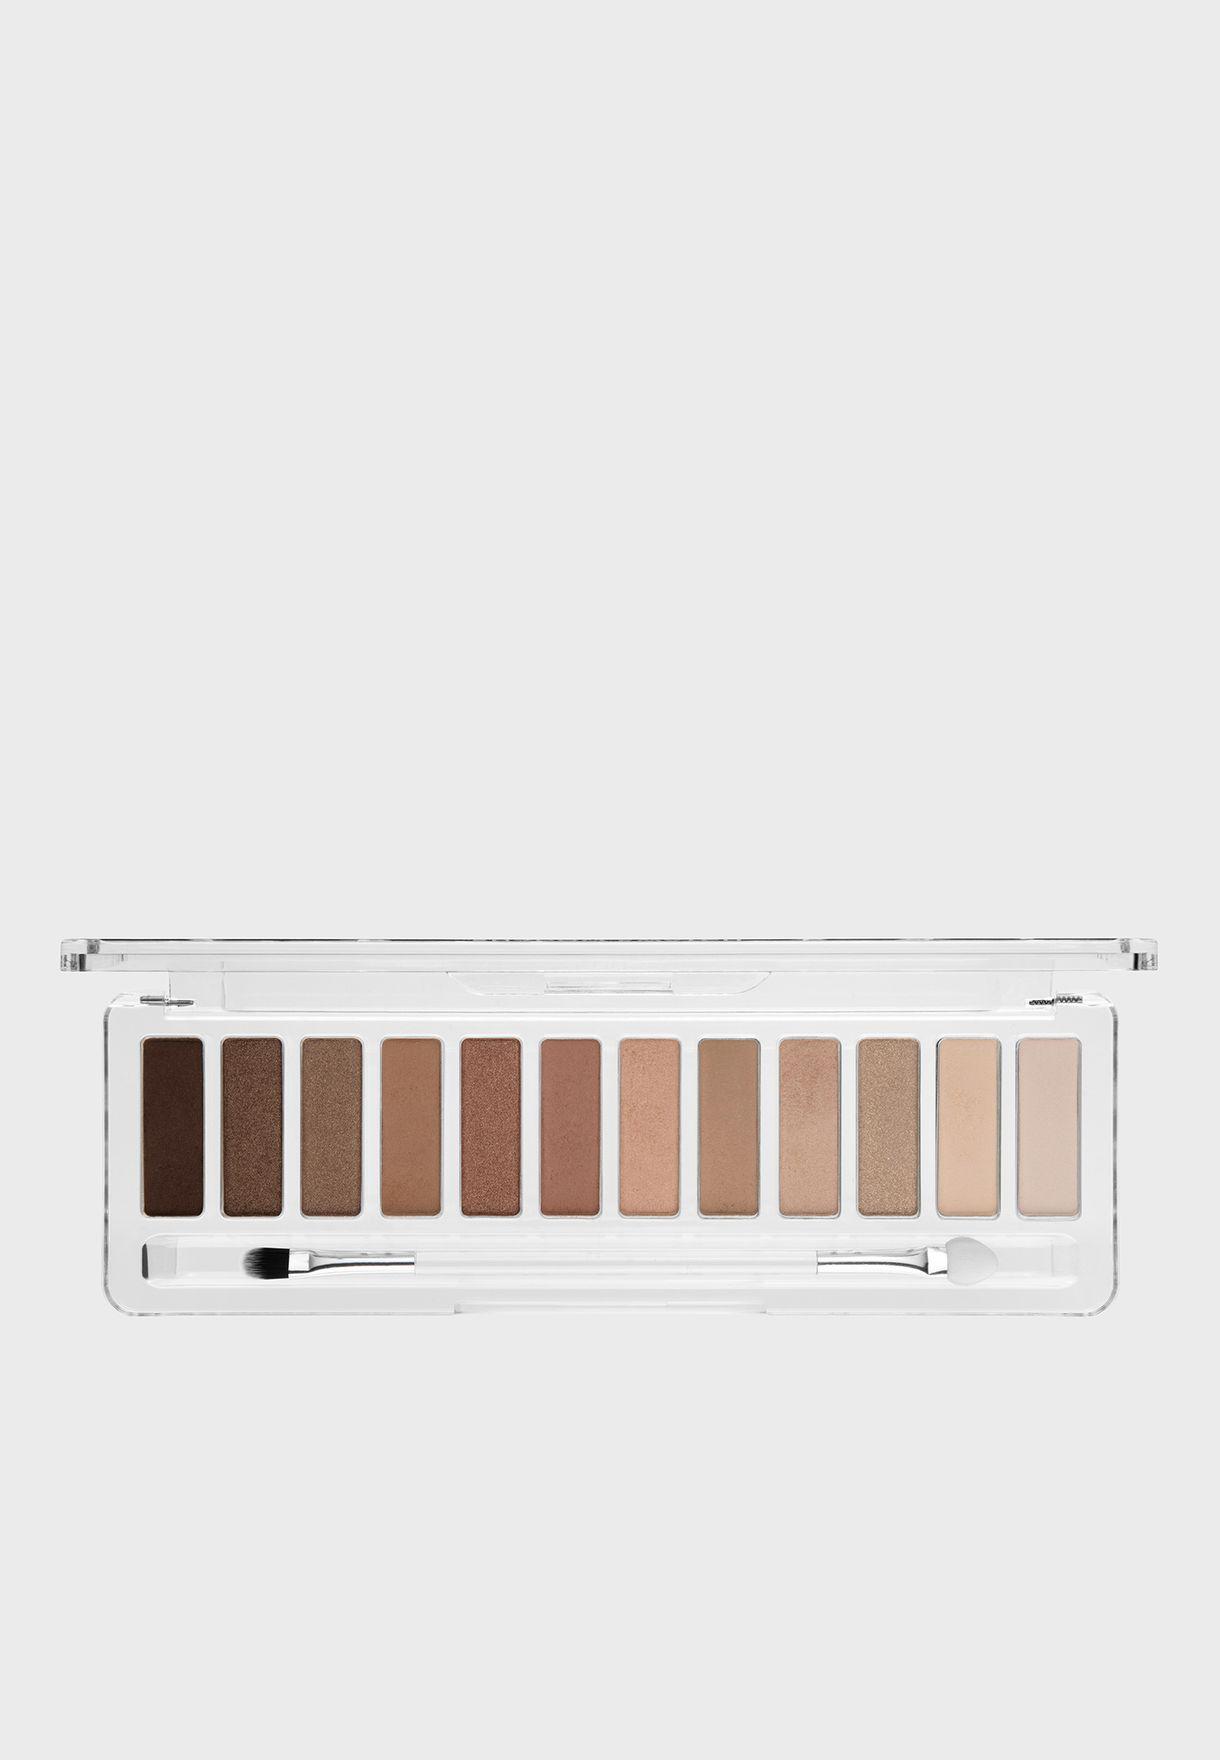 12 Pack Eyeshadow Palette - The Nudes